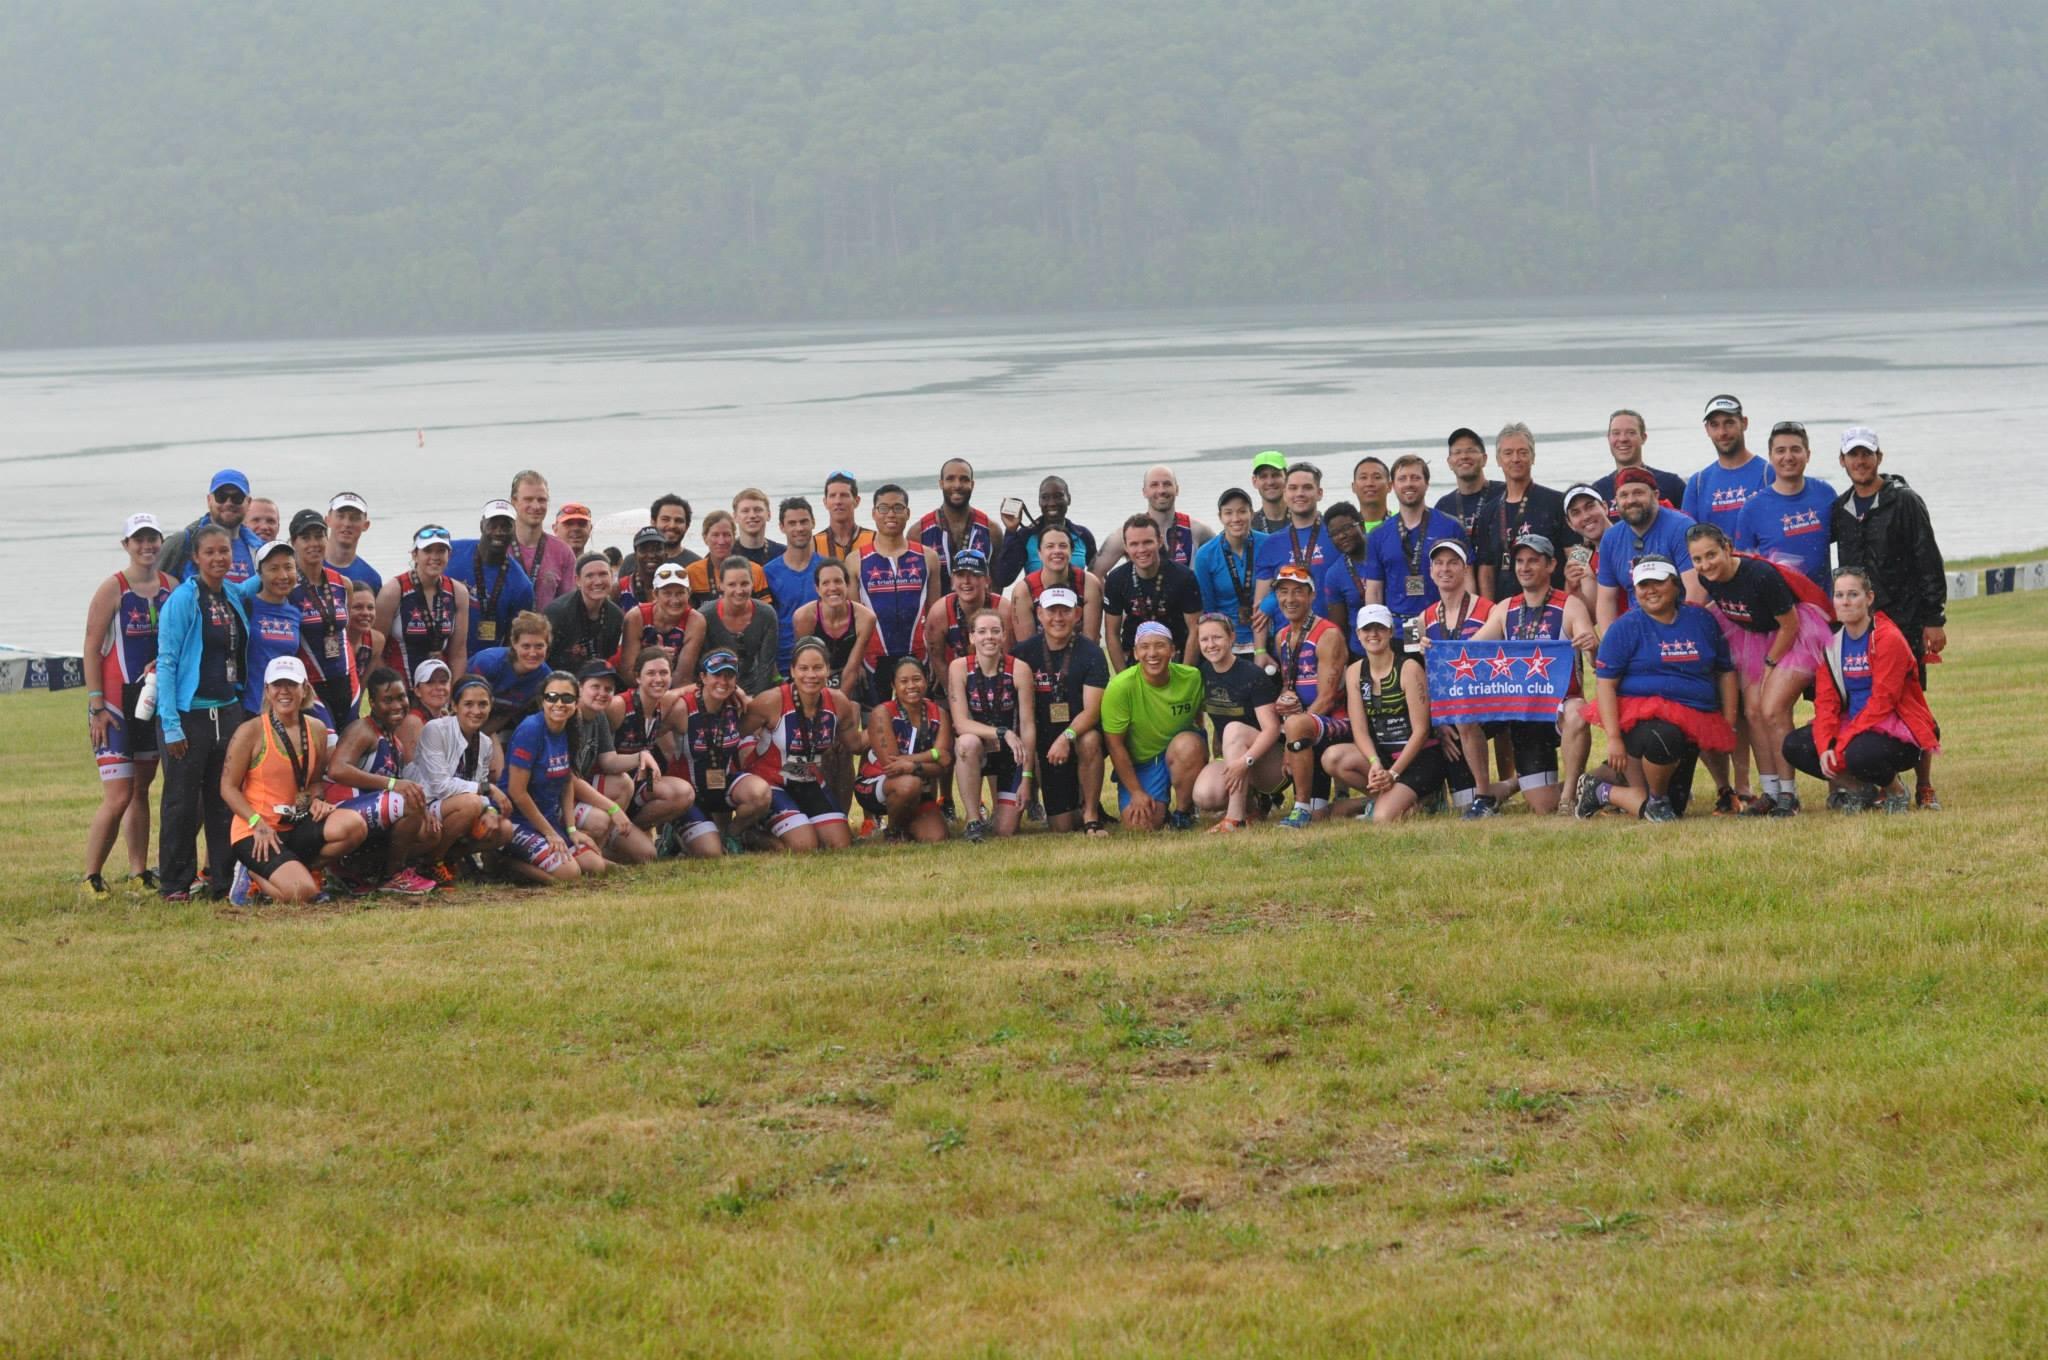 New Triathlete Program (NTP) Registration Now Open!